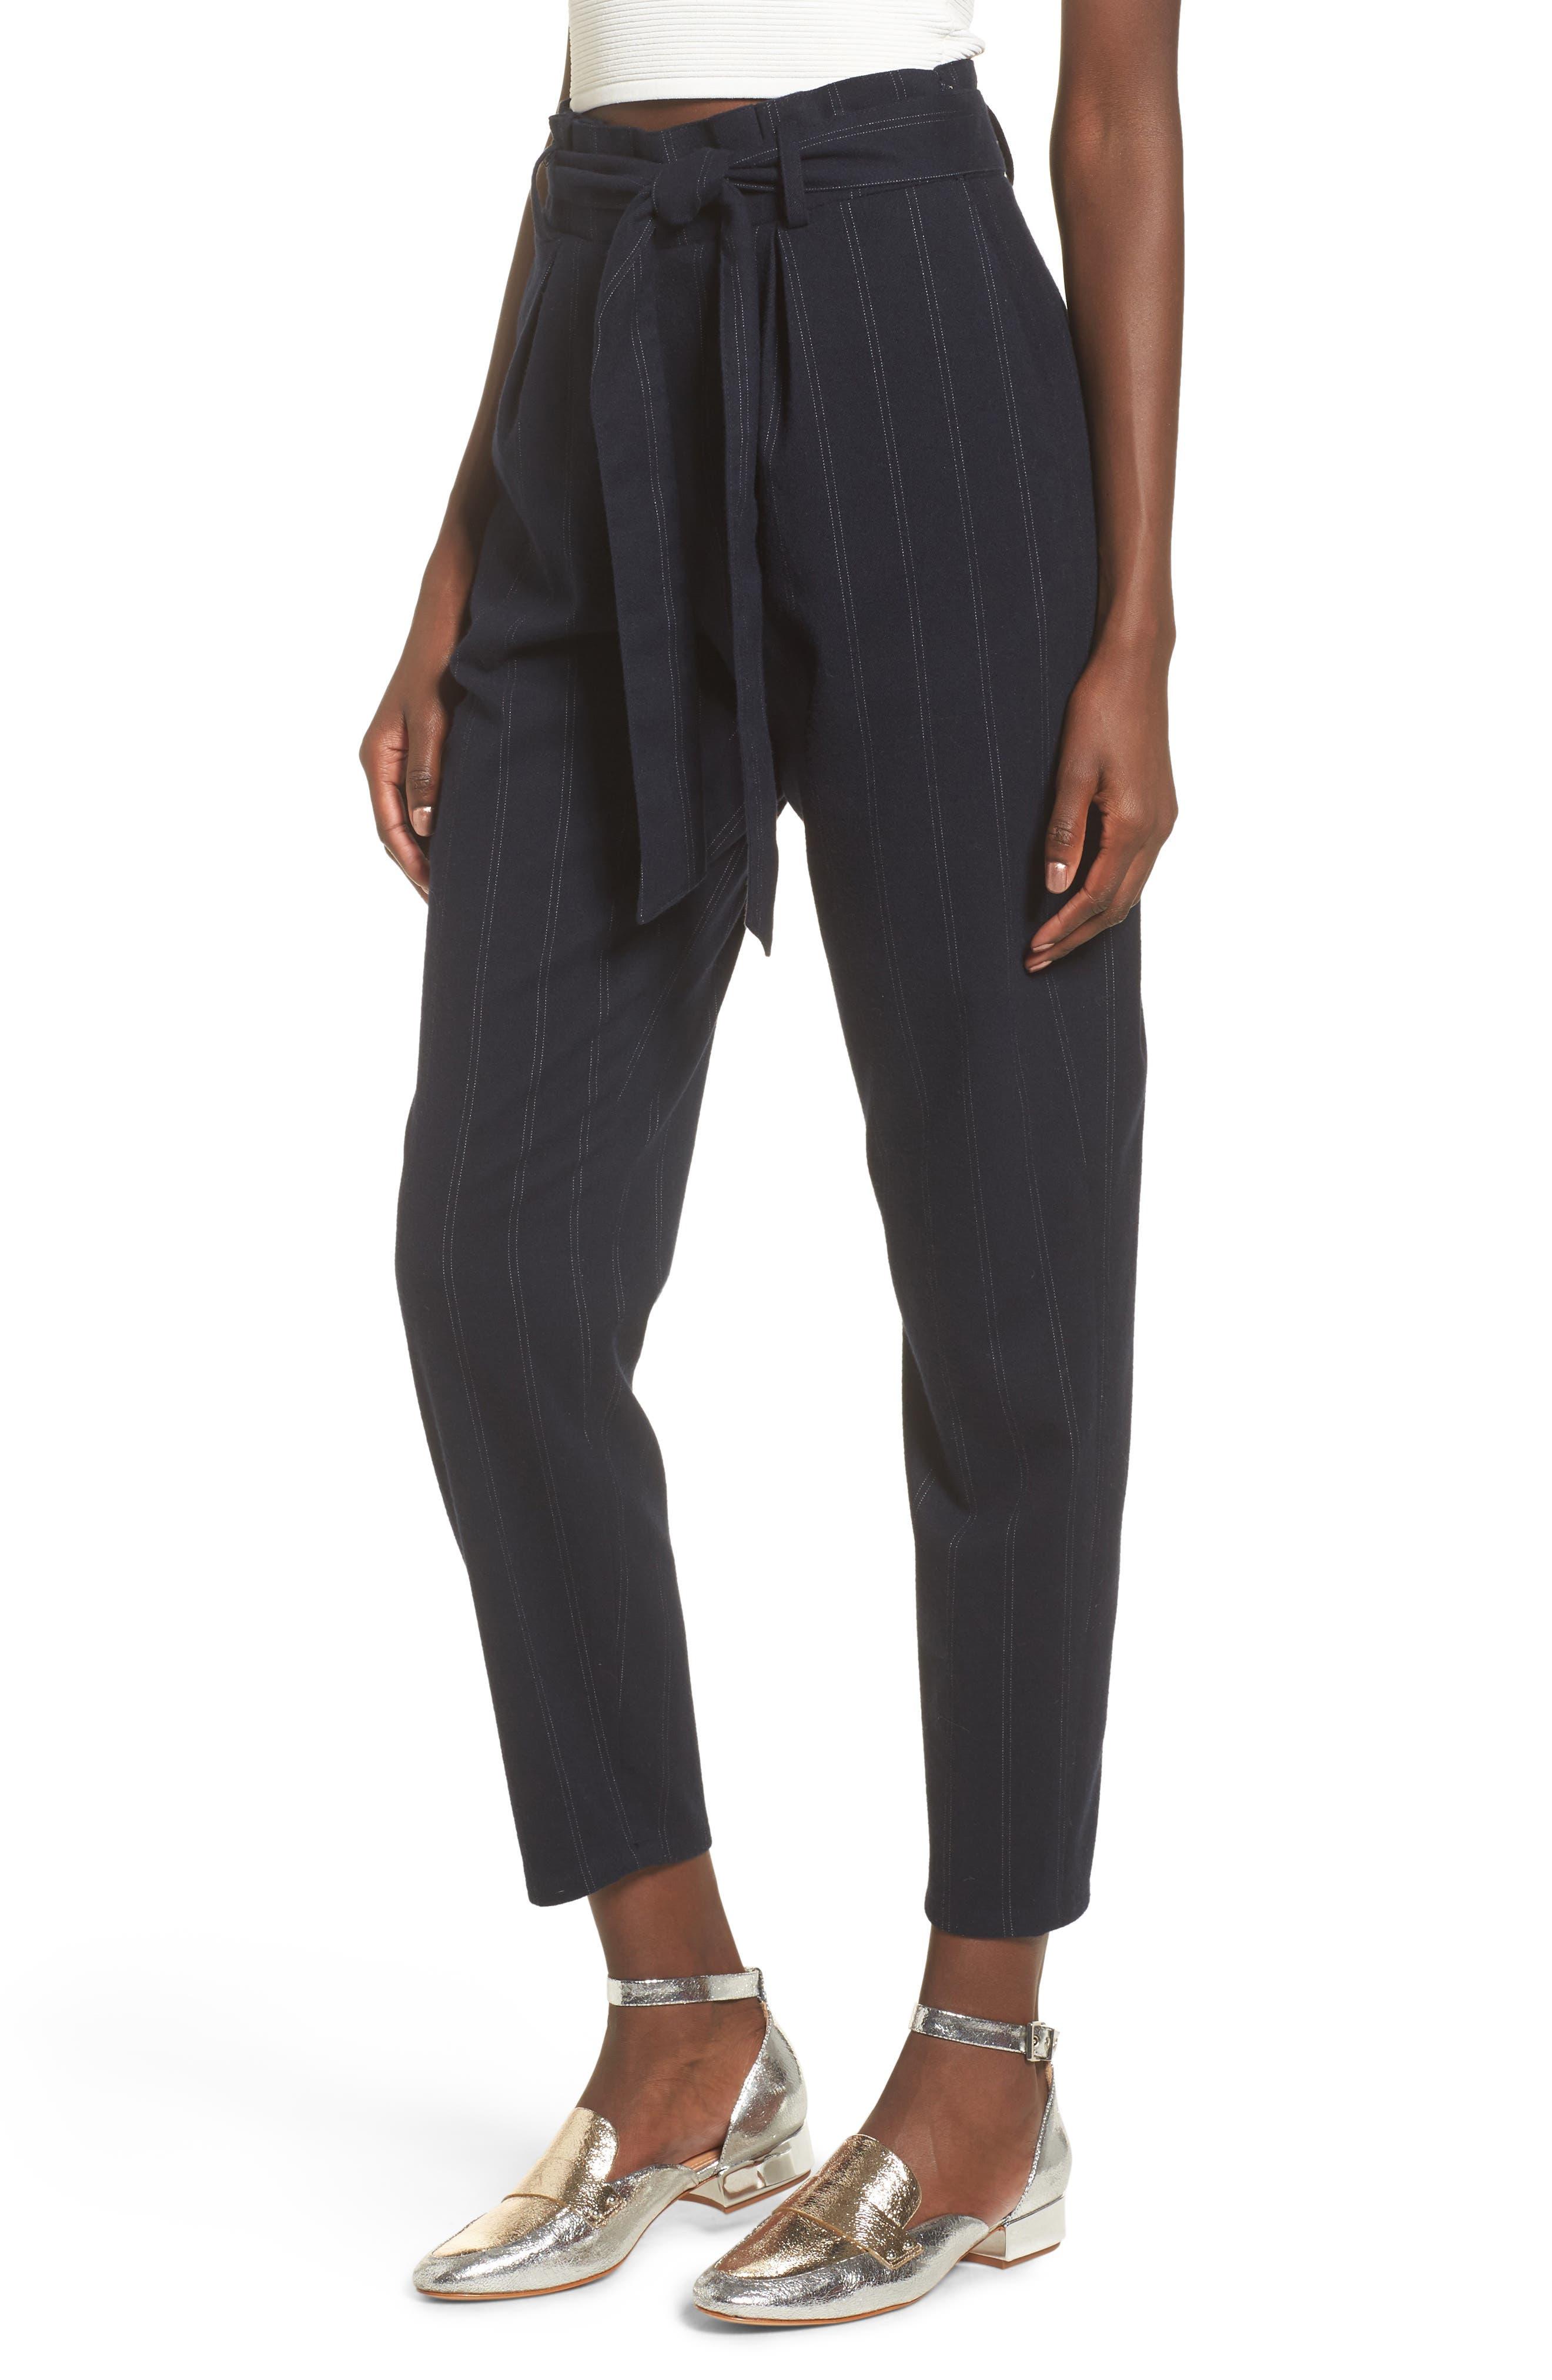 Wide Leg Trouser Pants Gbonidv8